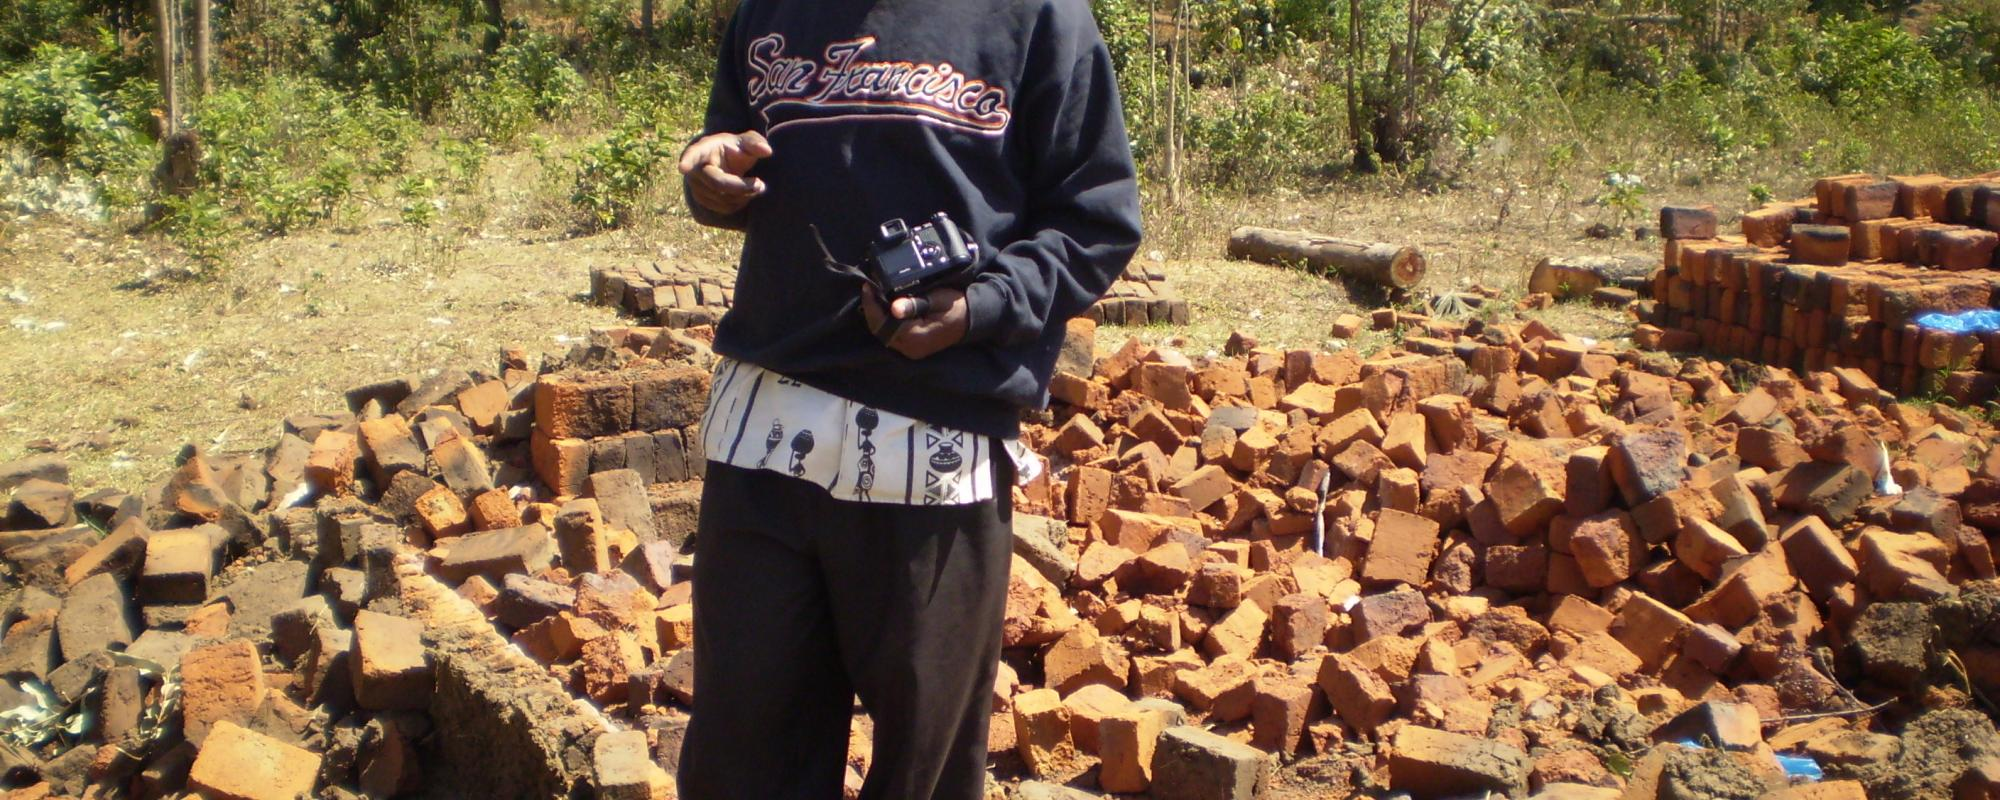 man standing in front of piles of bricks